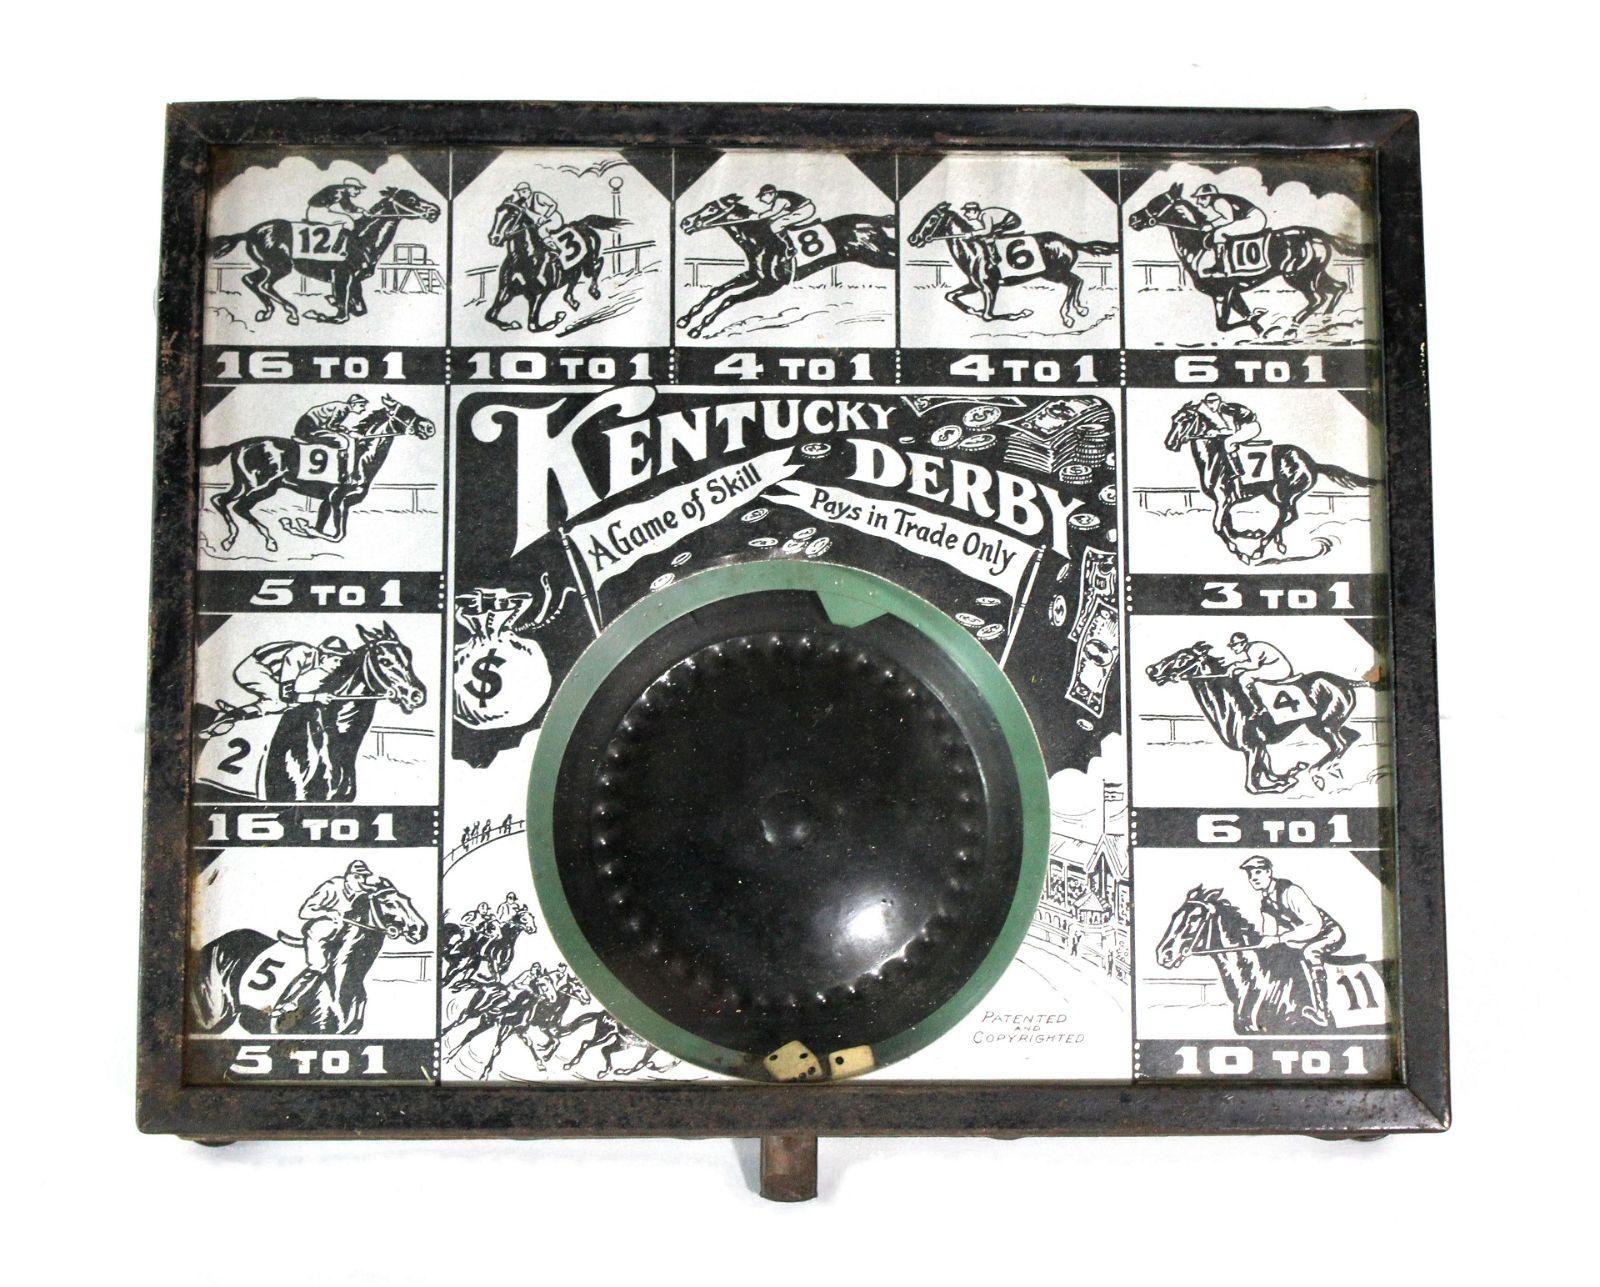 Kentucky Derby Dice Game